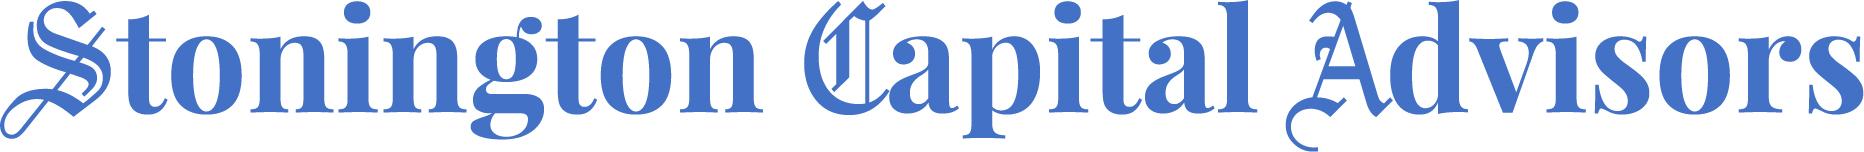 Rudgers joins Stonington Capital Advisors – Stonington Capital Advisors